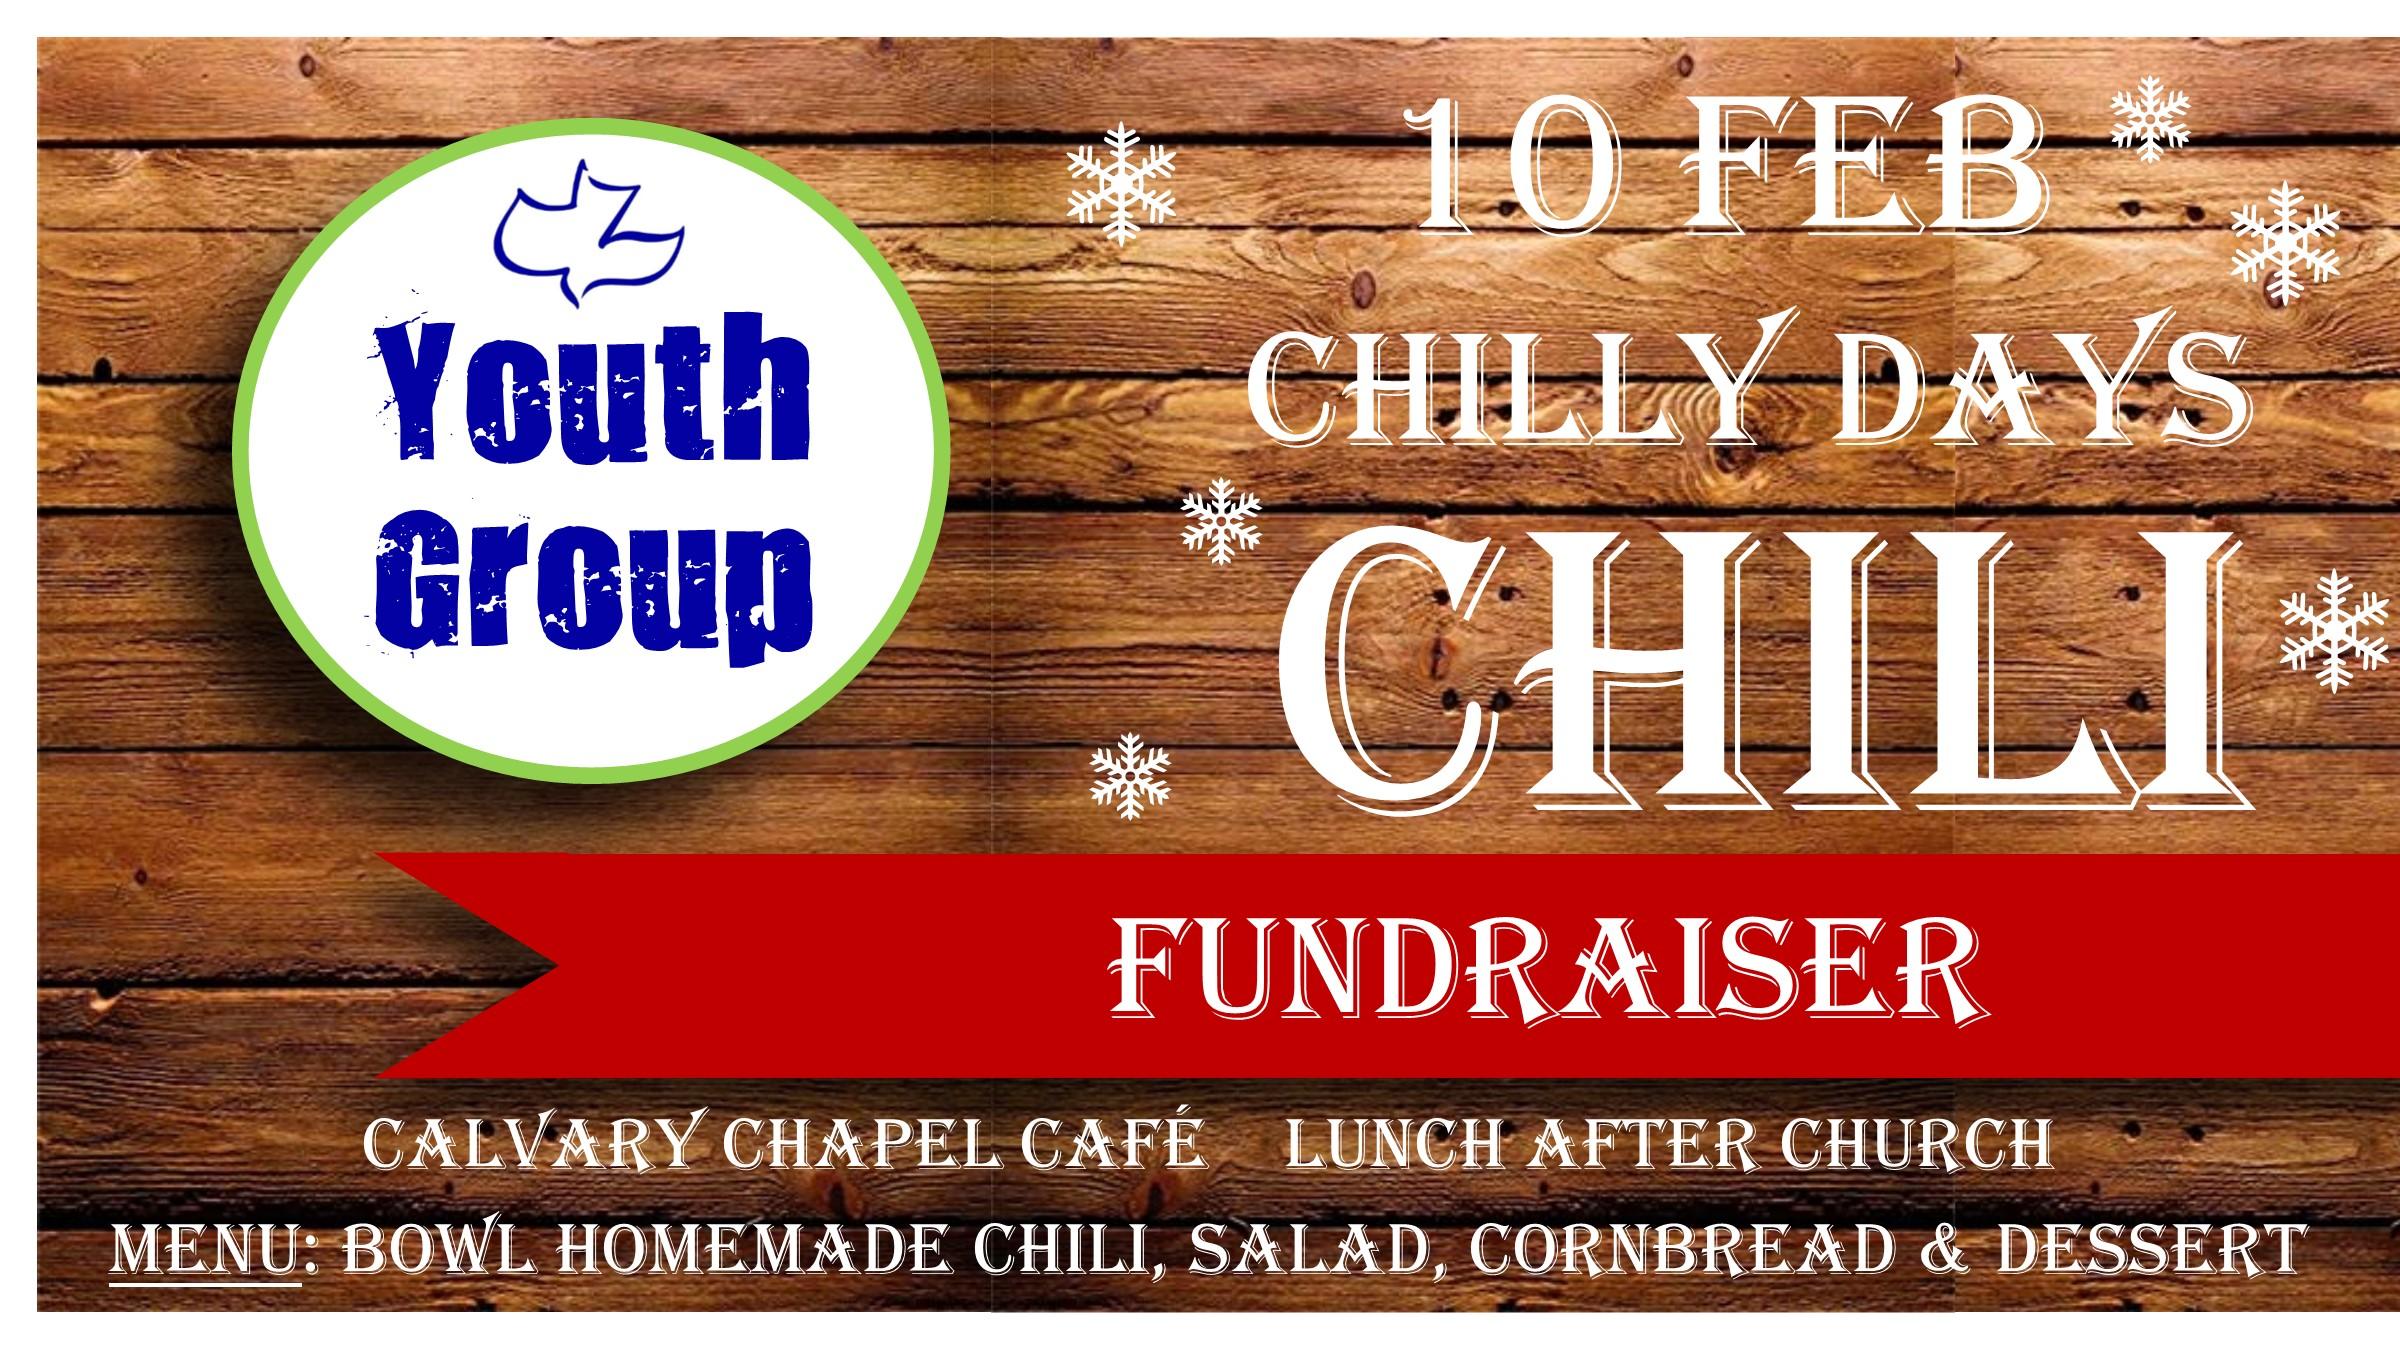 Youth Group Chili Fundraiser EW WEB.jpg